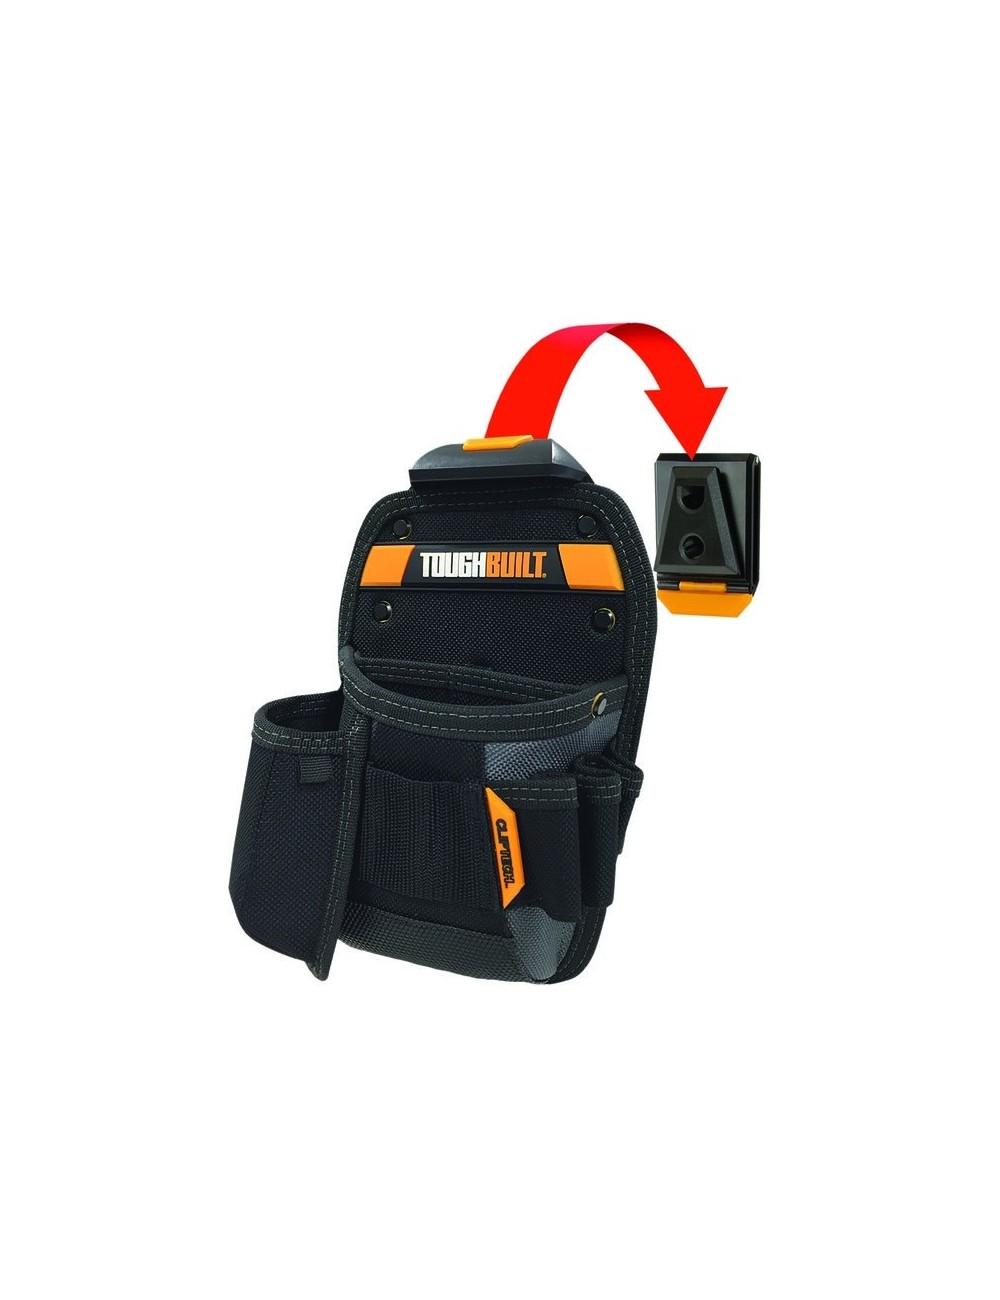 Toughbuilt torba universal pouch TB-CT-26